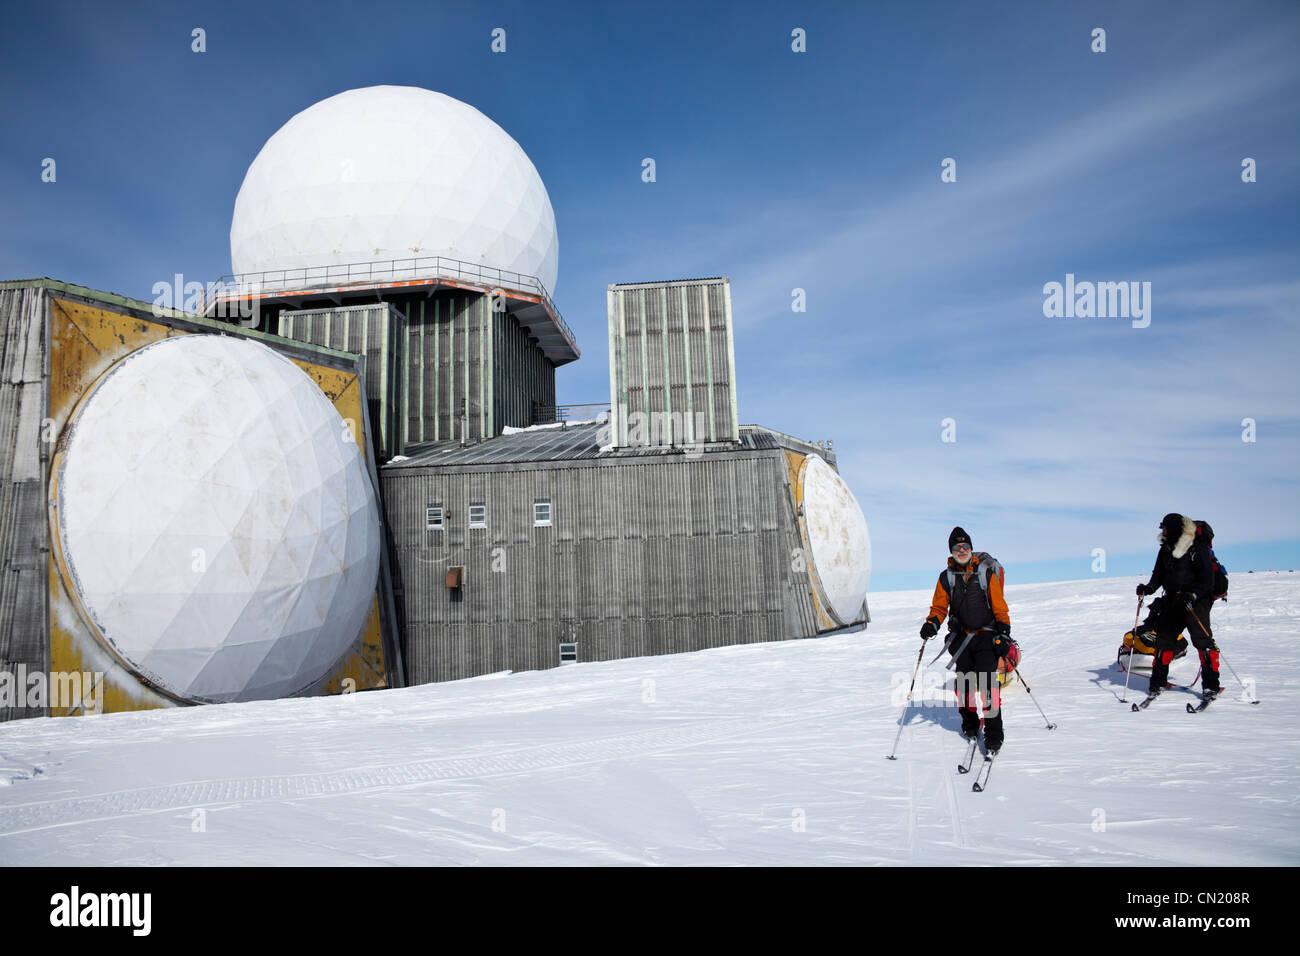 Ancienne station radar de la guerre froide, DYE 2, au Groenland Photo Stock